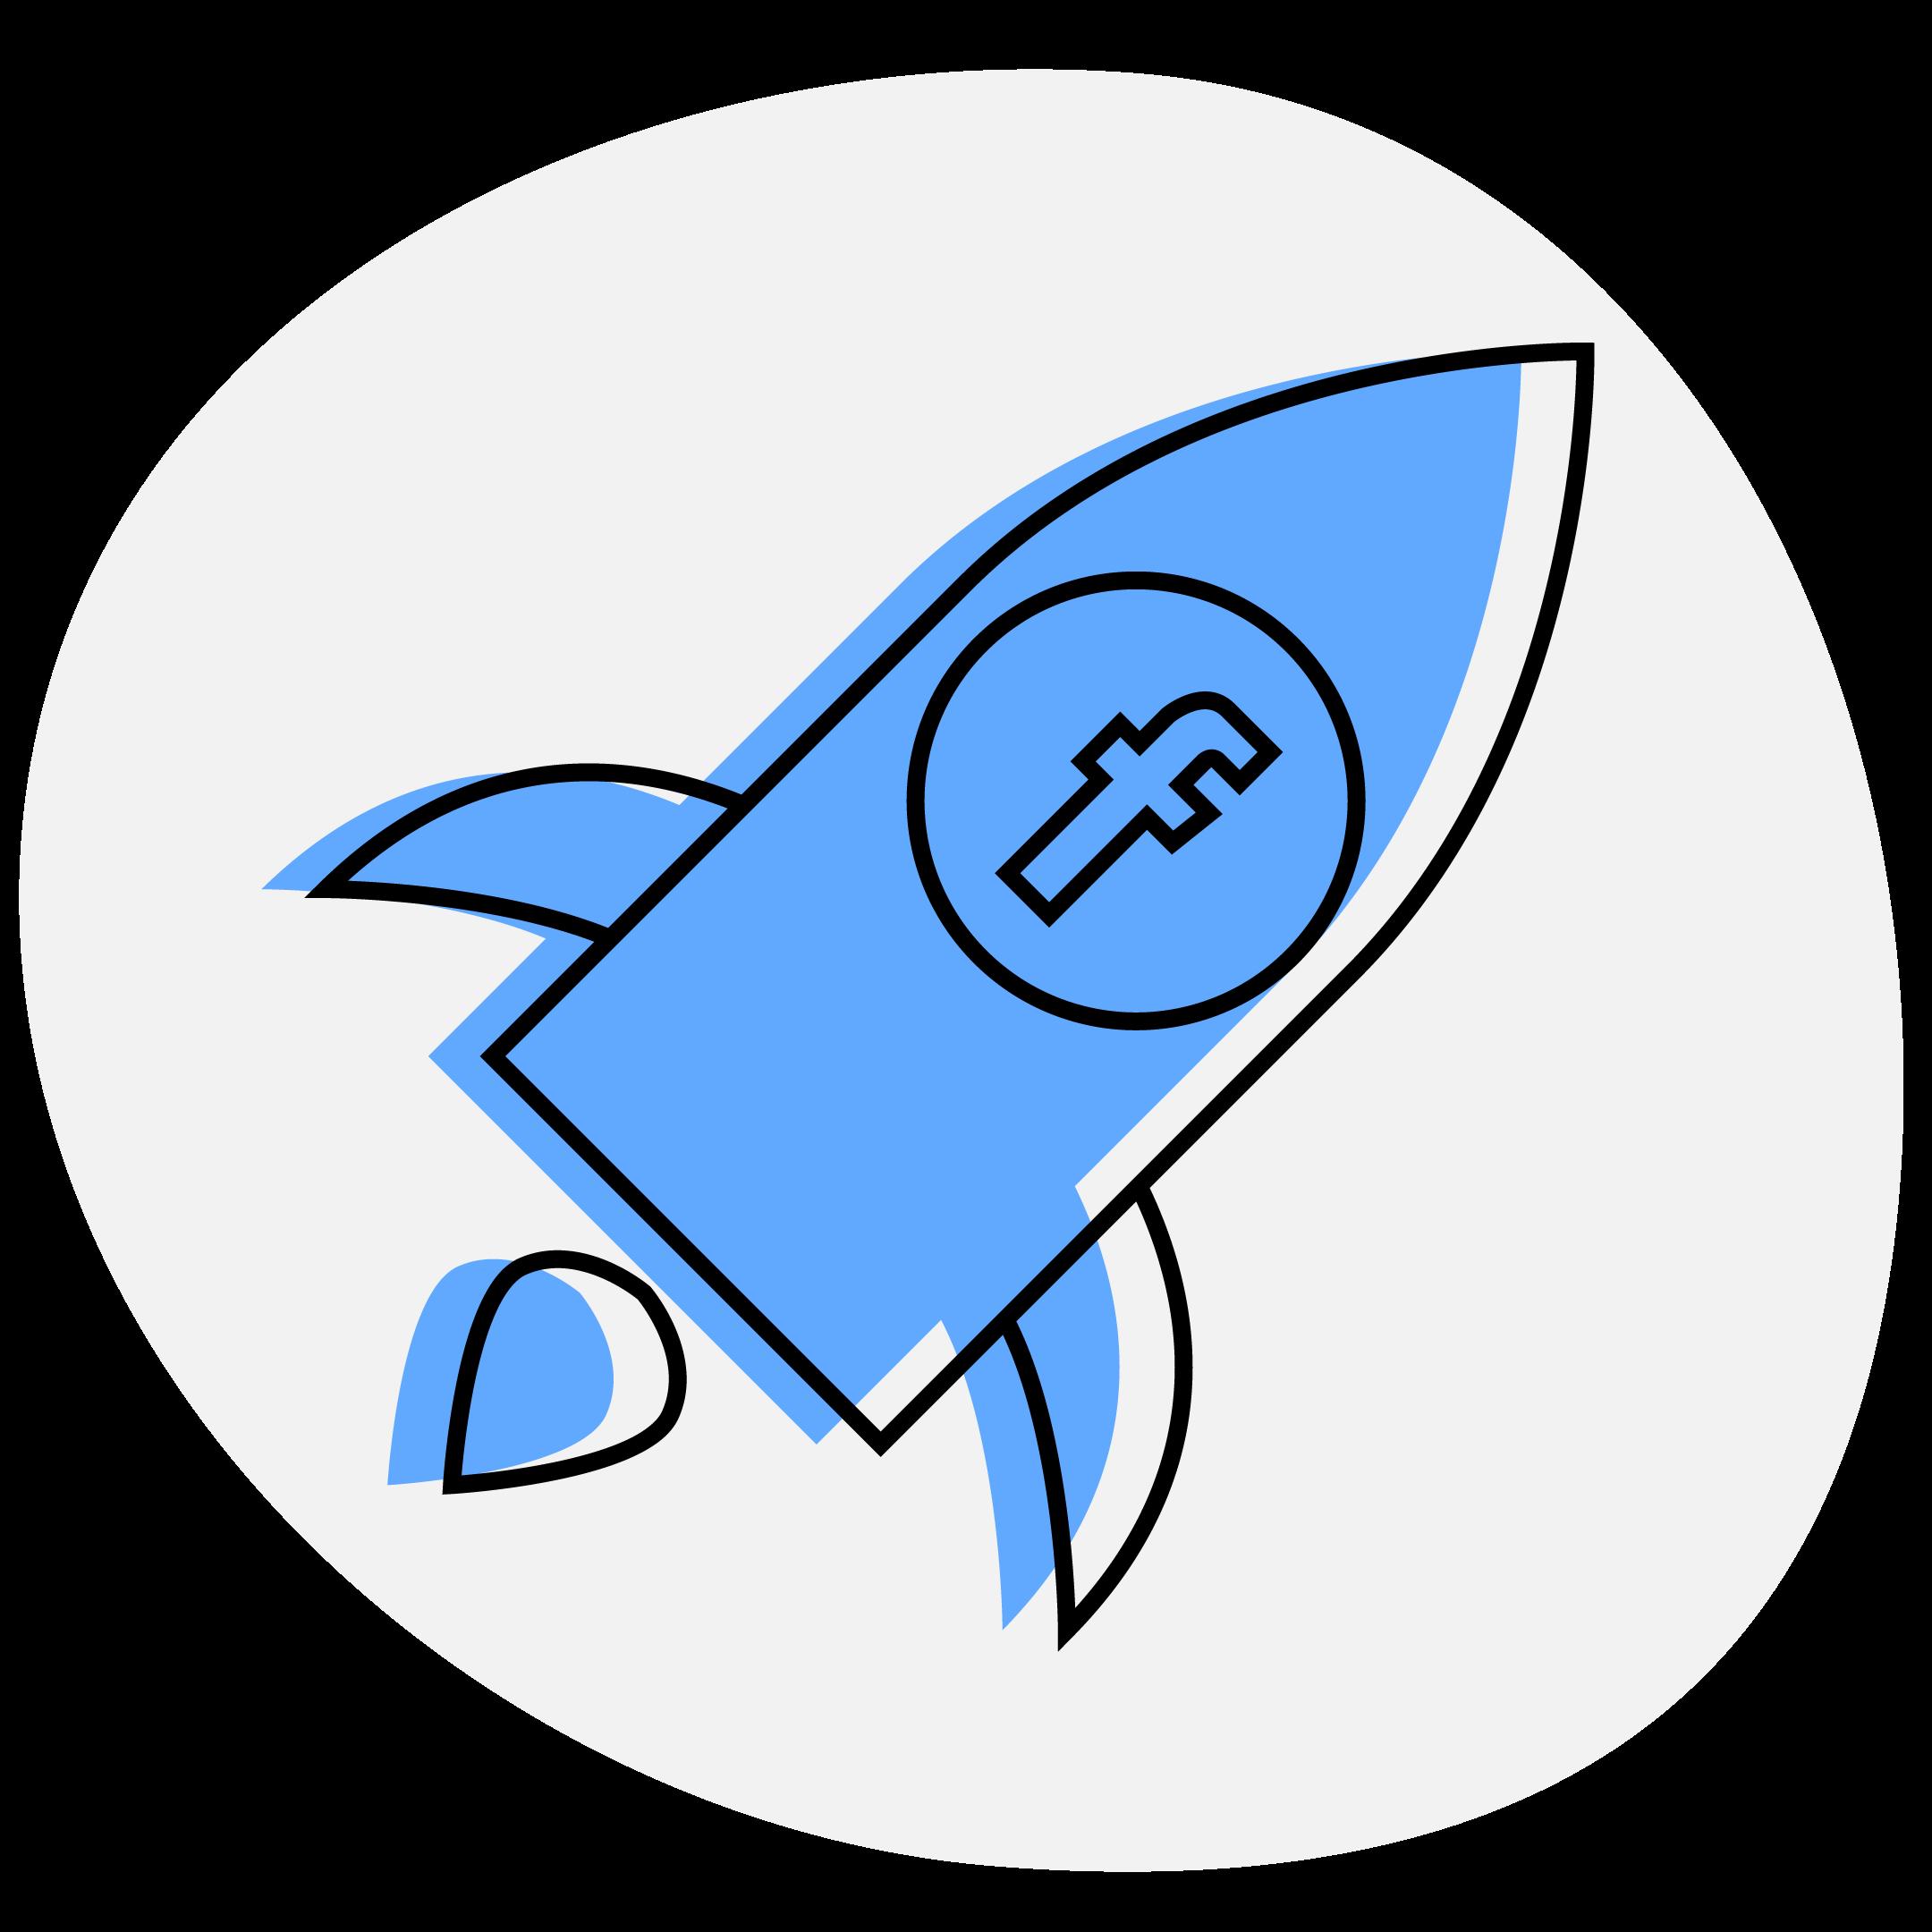 rocket-ship.png